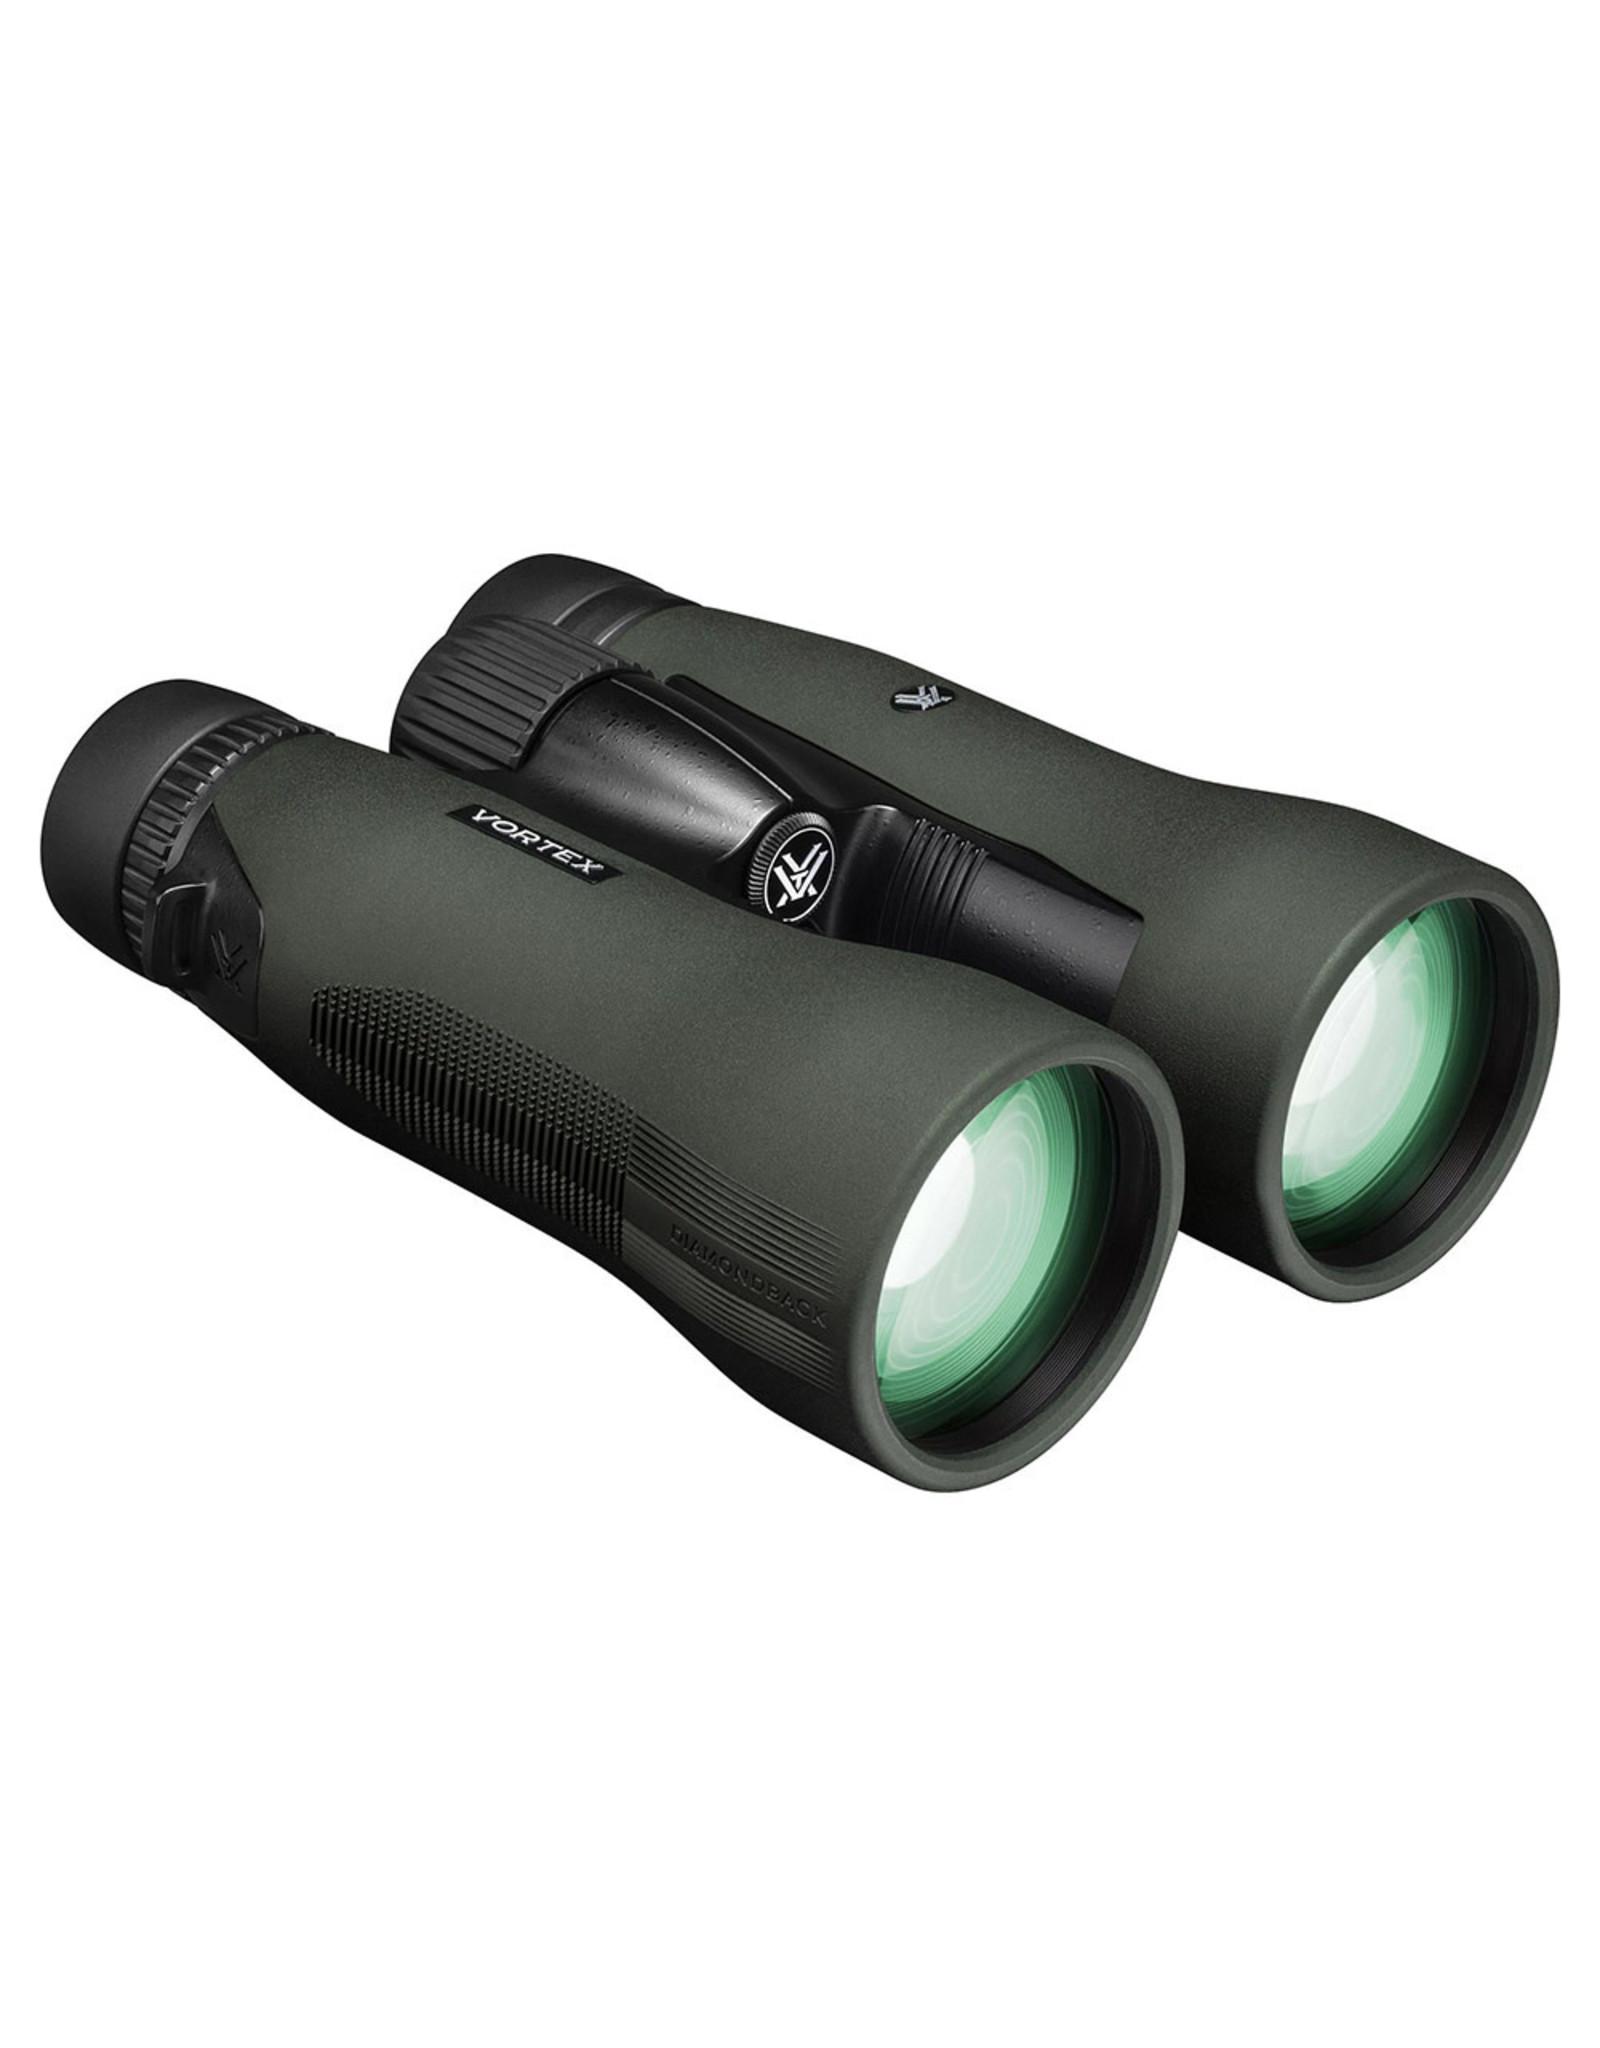 Vortex Optics Vortex Diamondback HD 15X56 Binoculars